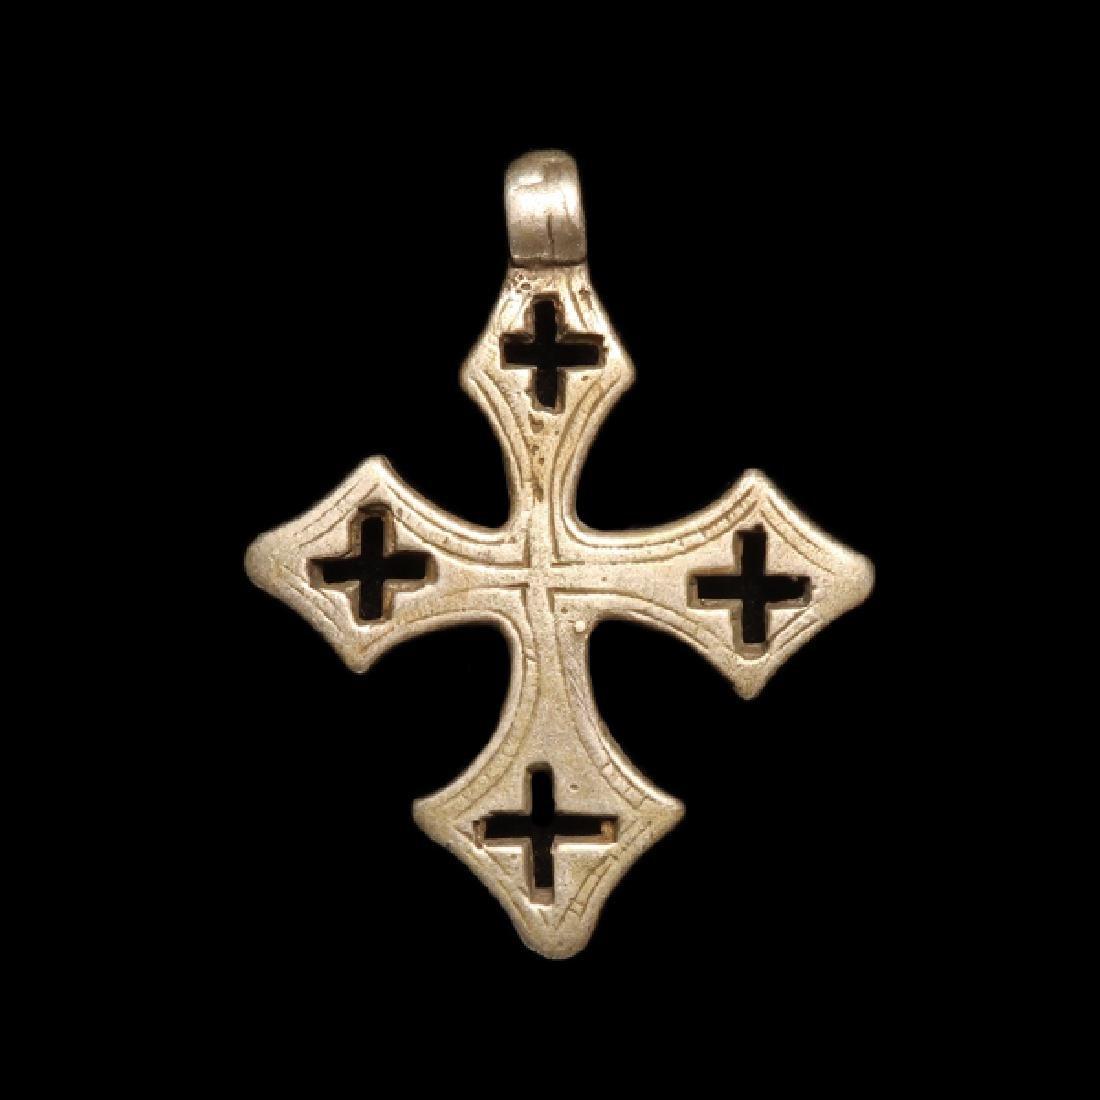 Byzantine Silver Cross, c. 8th-10th Century A.D.